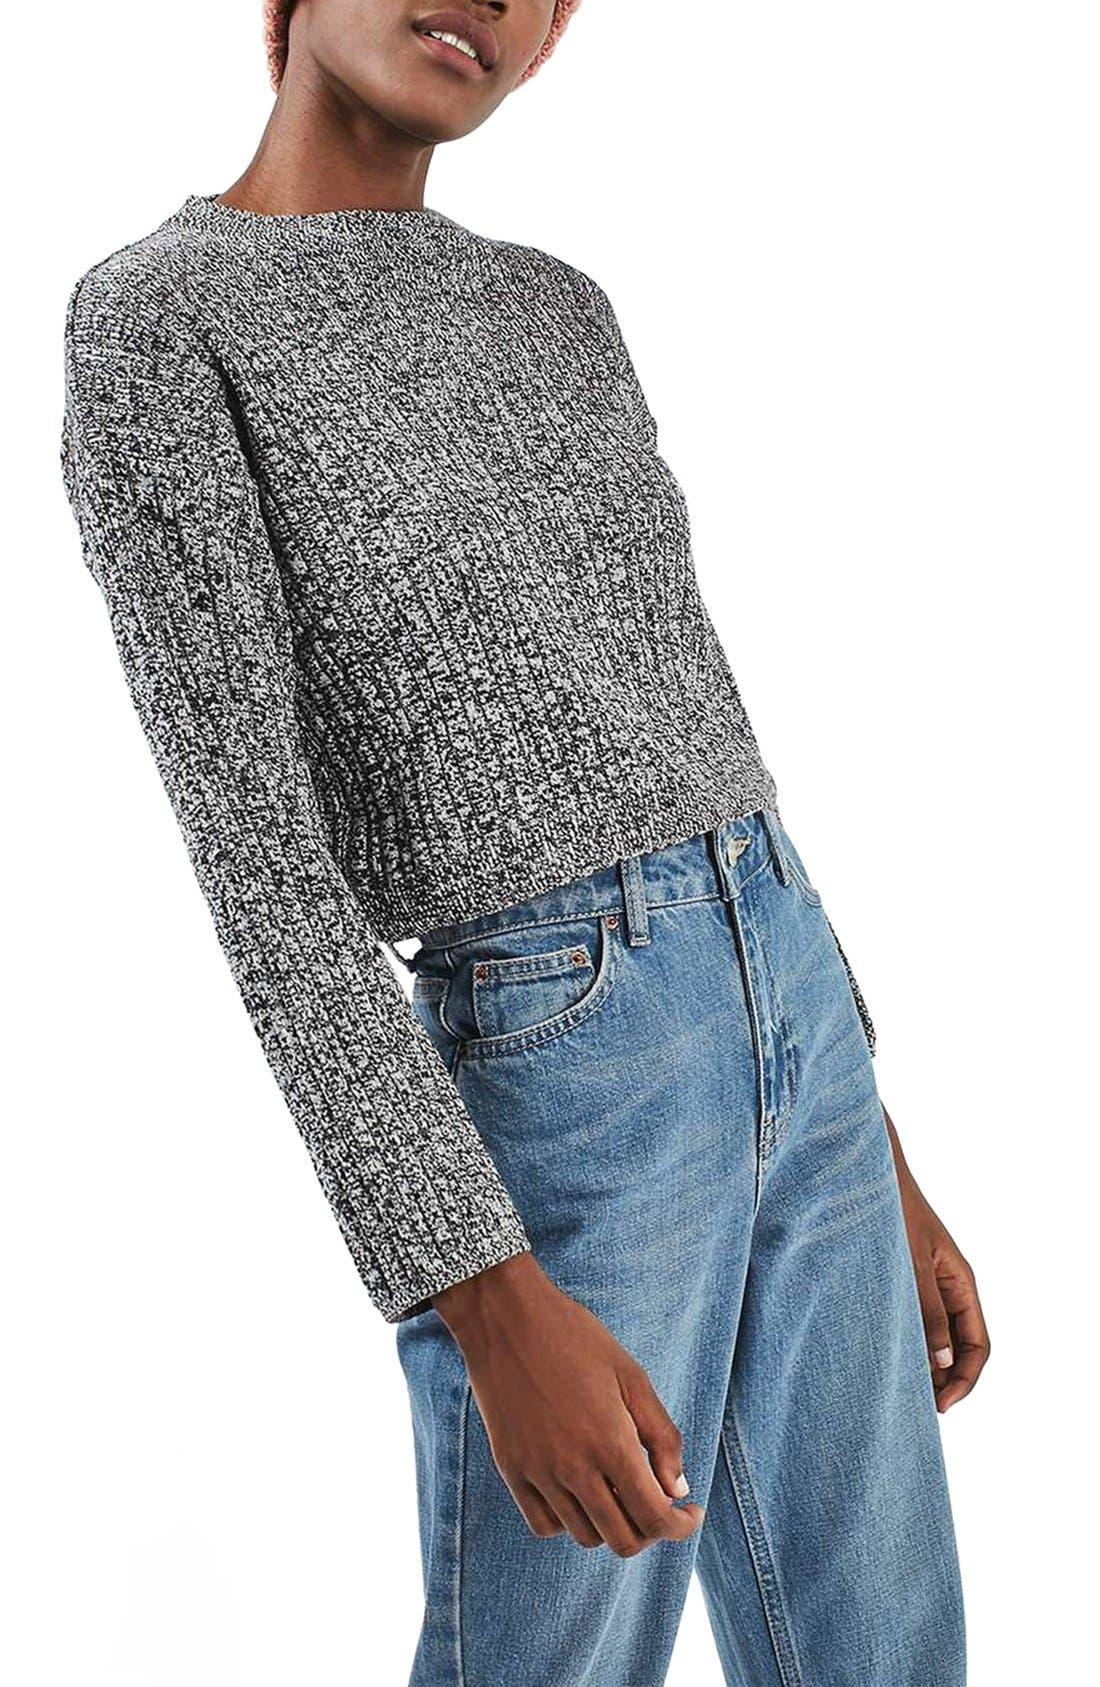 Alternate Image 1 Selected - Topshop Marled Crop Sweater